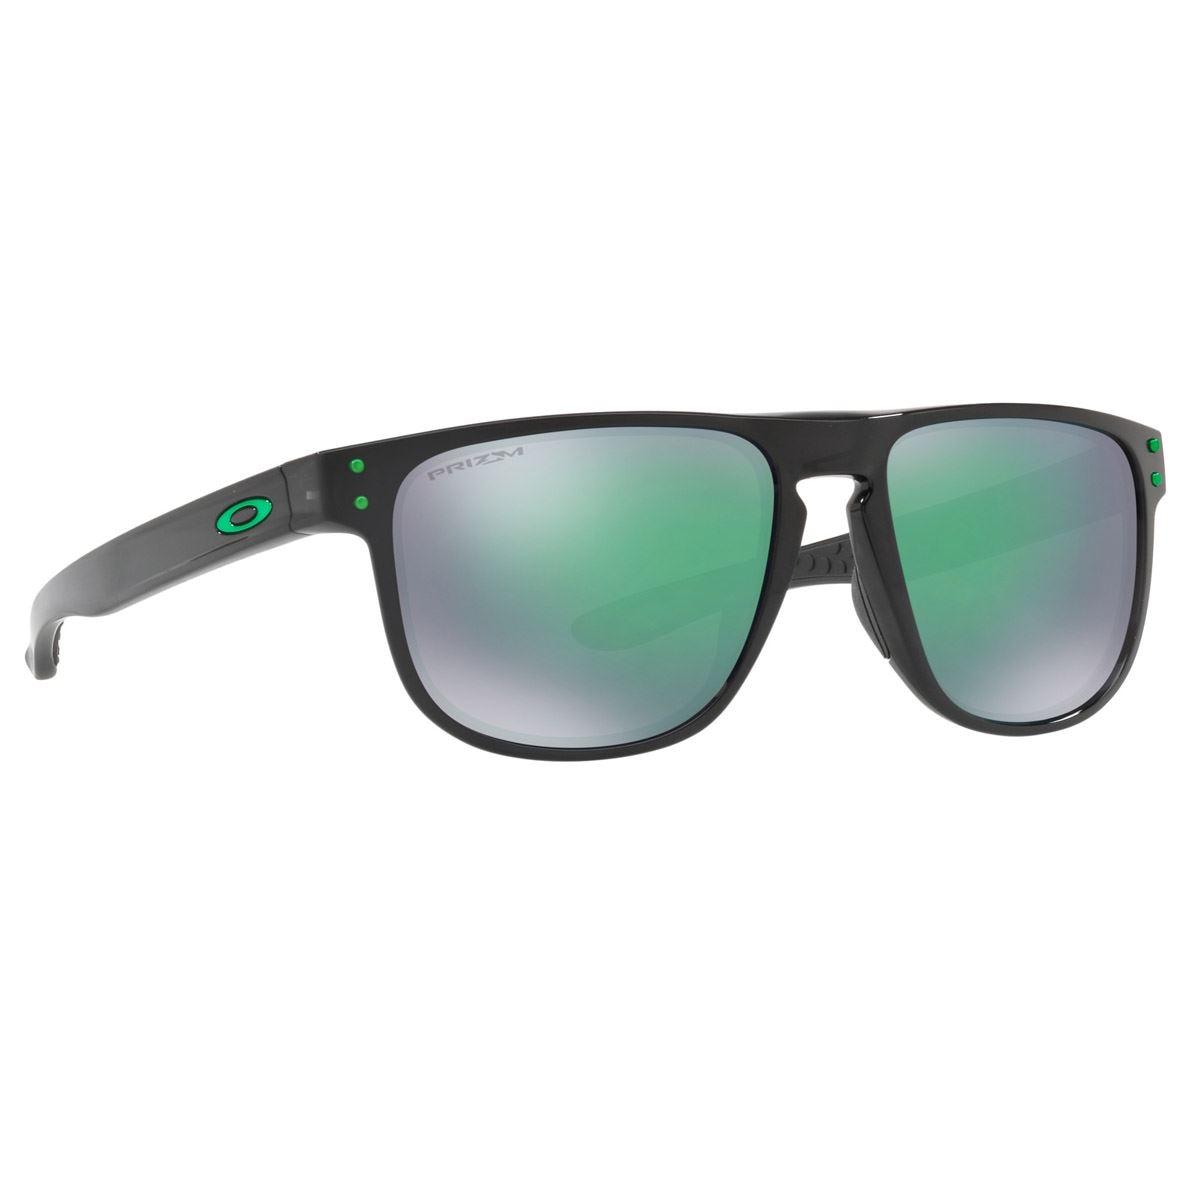 Oakley holbrook r prizm gris-verde armazón negro  - Sanborns